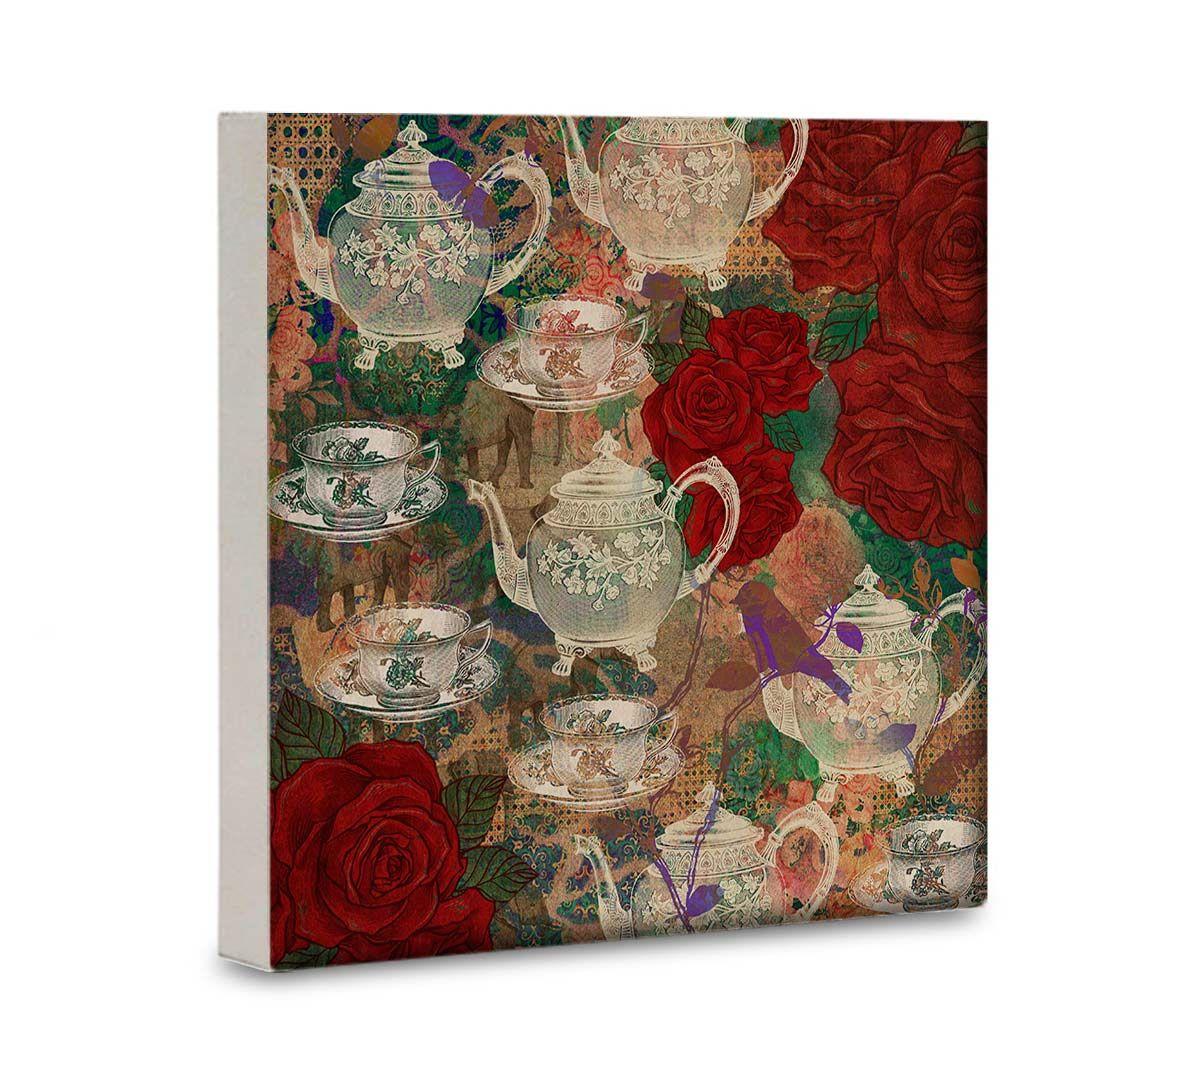 India Circus Teapot Jungle 16x16 and 24x24 Canvas Wall Art